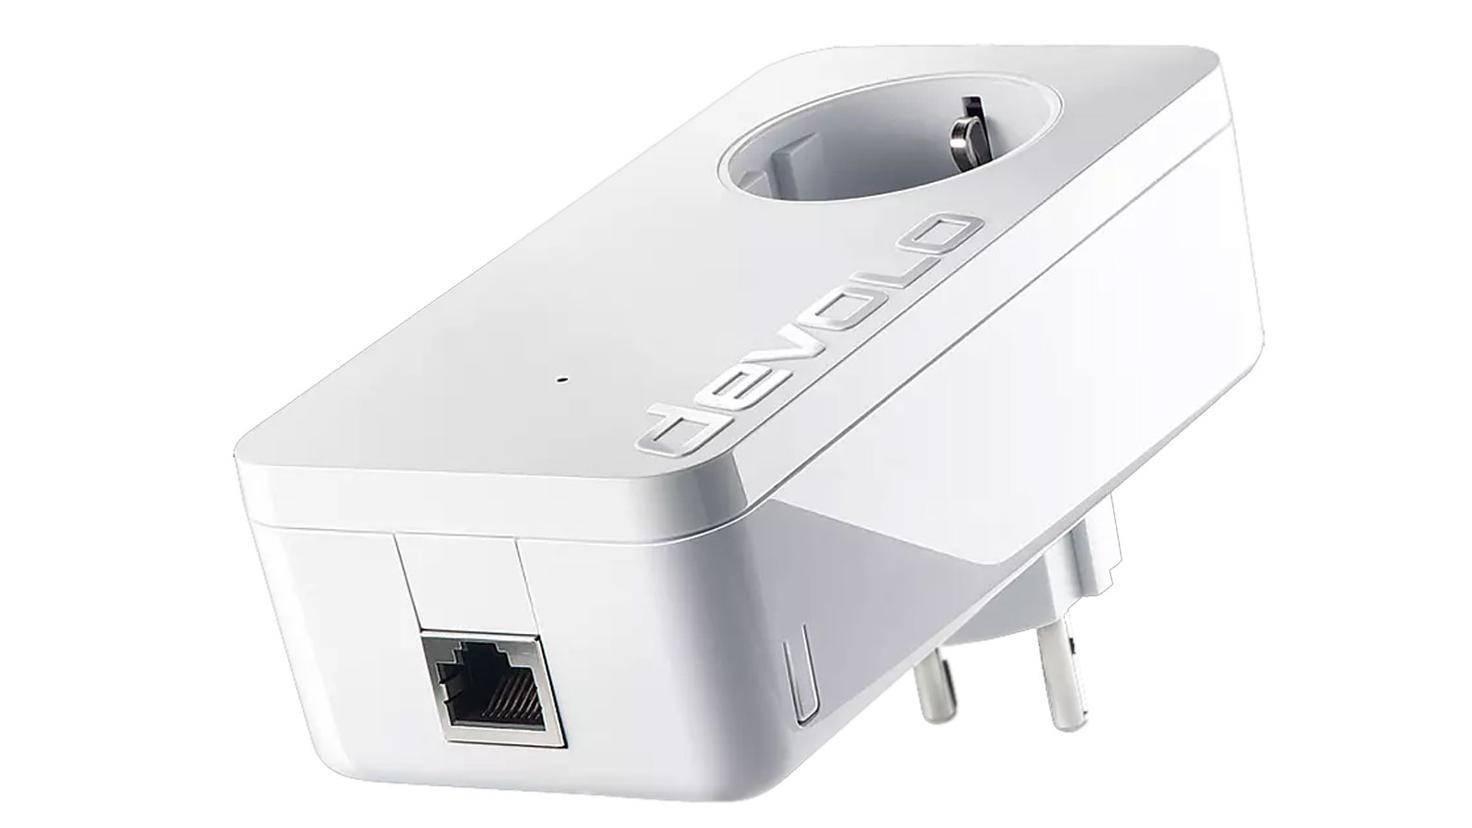 Devolo 9320 dLAN 1200+ Powerline Adapter